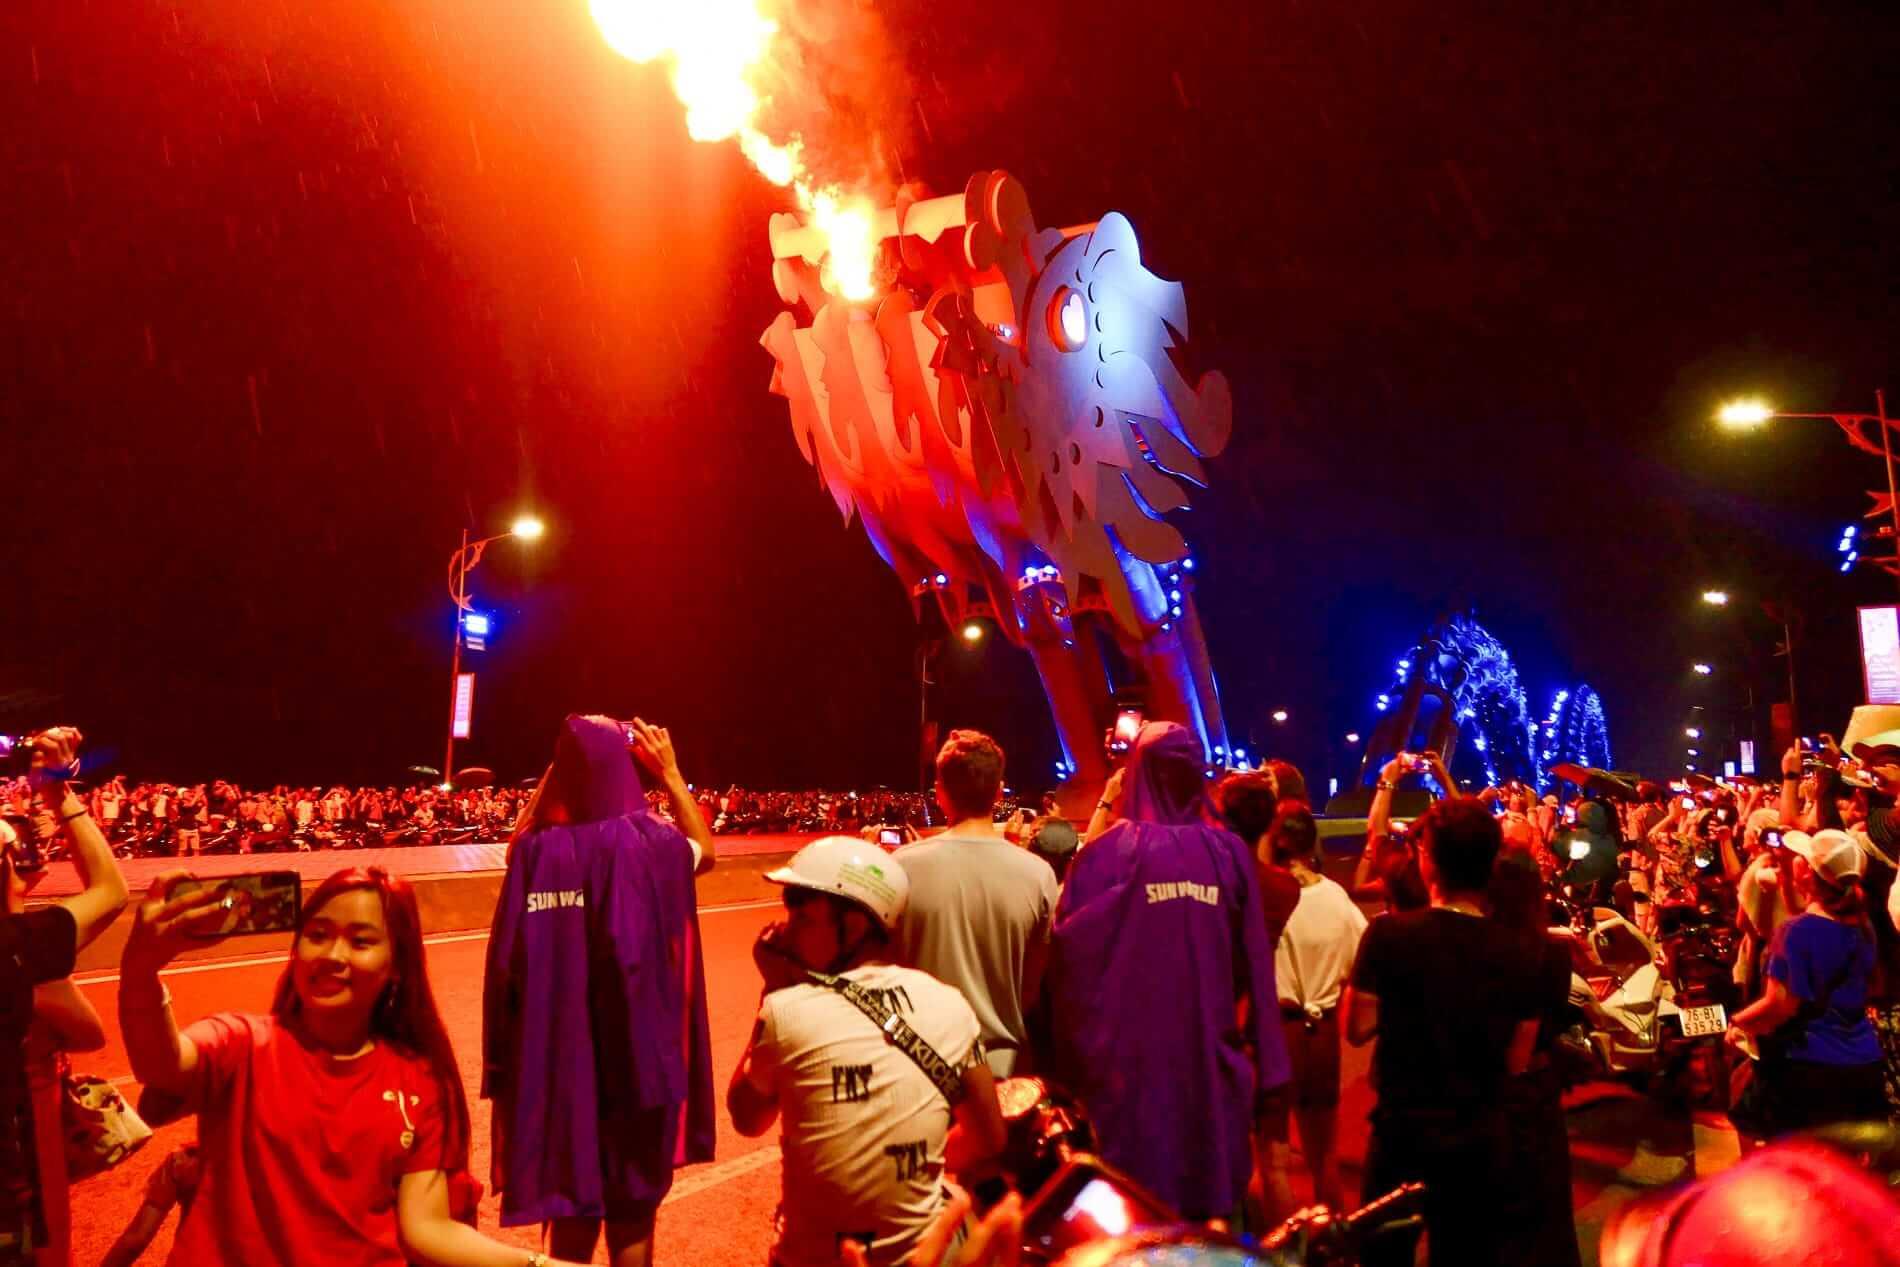 The Dragon Bridge breathing fire at night